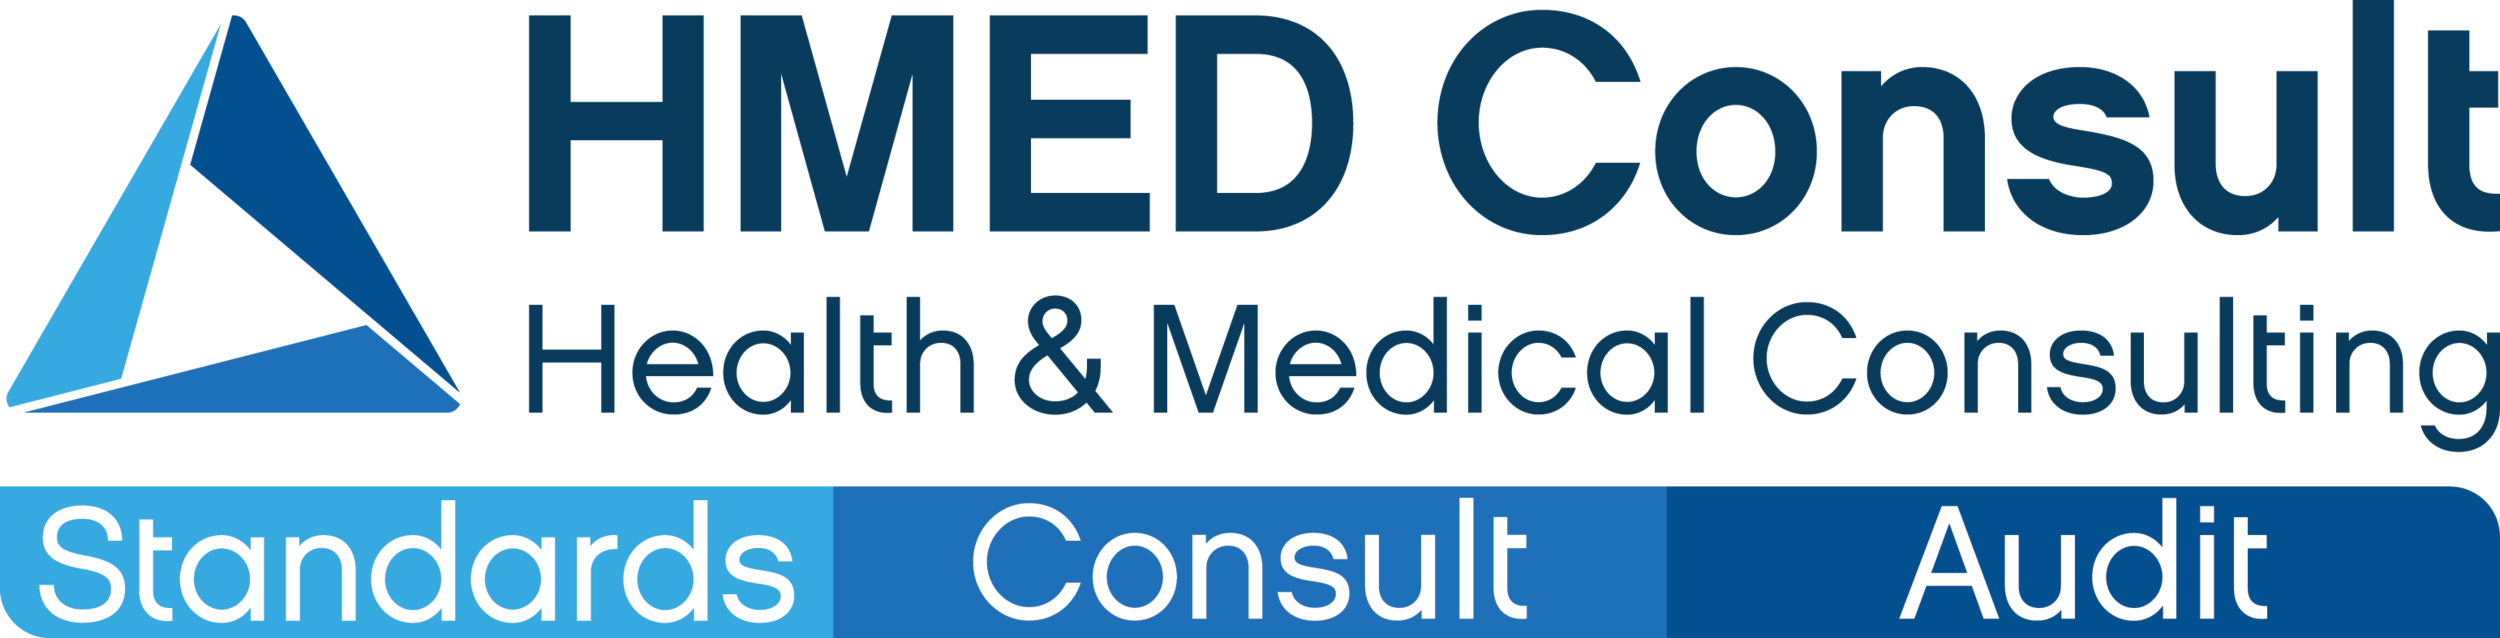 HMED Consult Full Logo_RGB_transparent.png